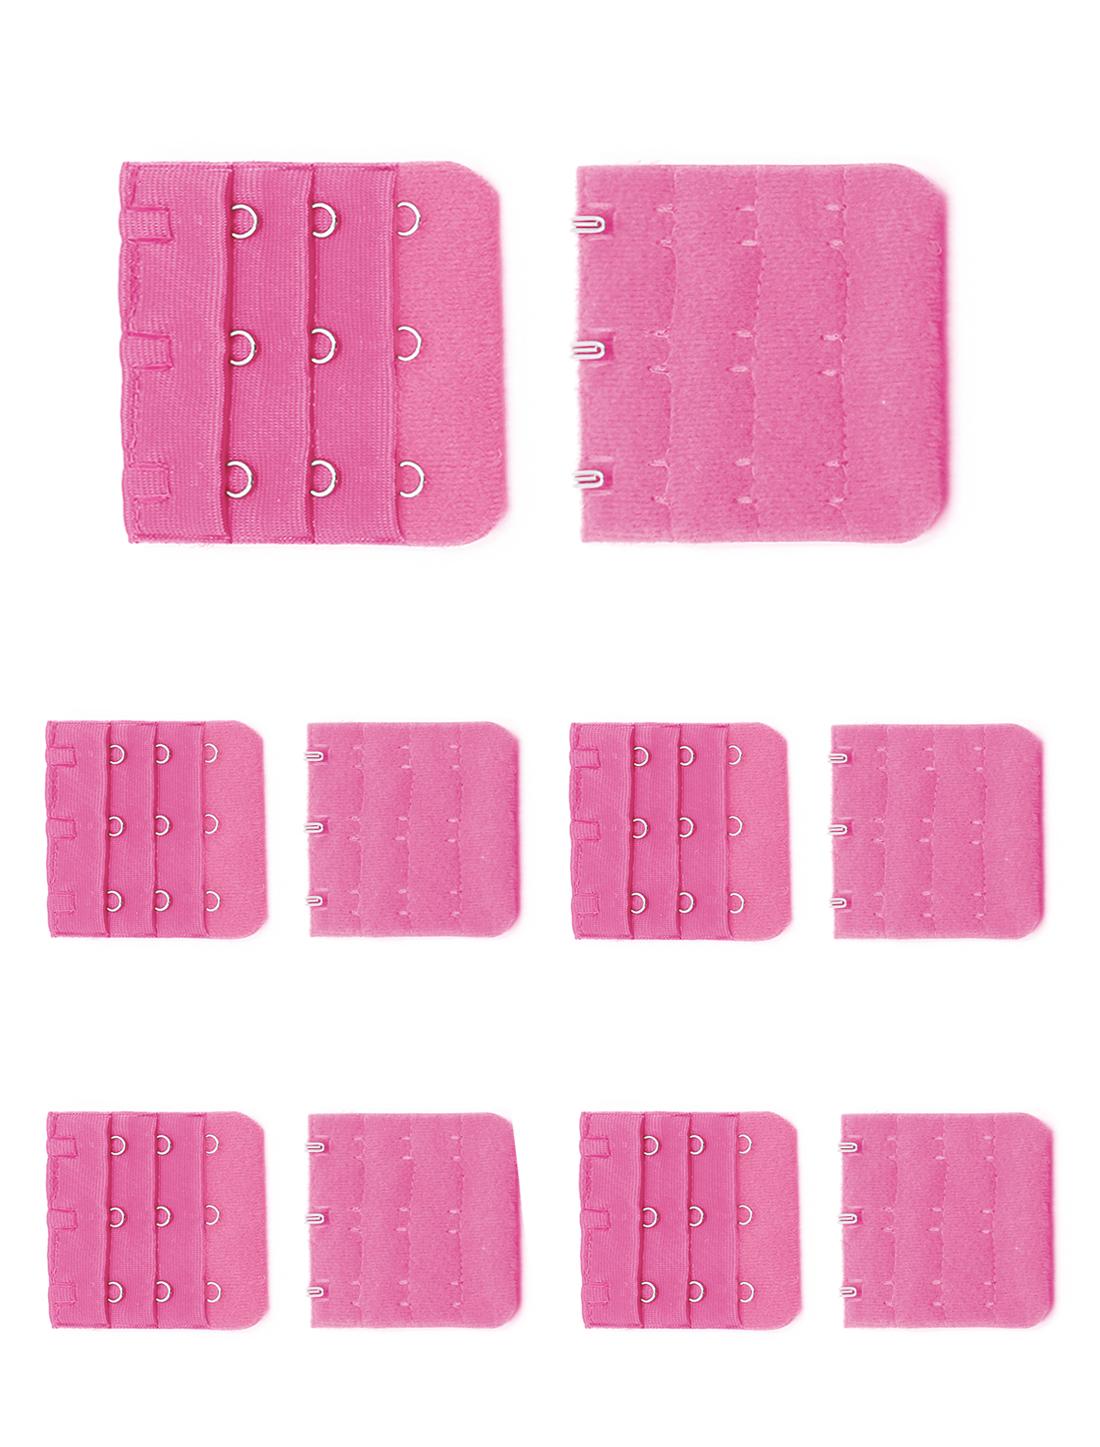 Women 3 Rows 3 Hooks Adjustable Bra Band Extension Strap Extenders 10 Pcs Pink